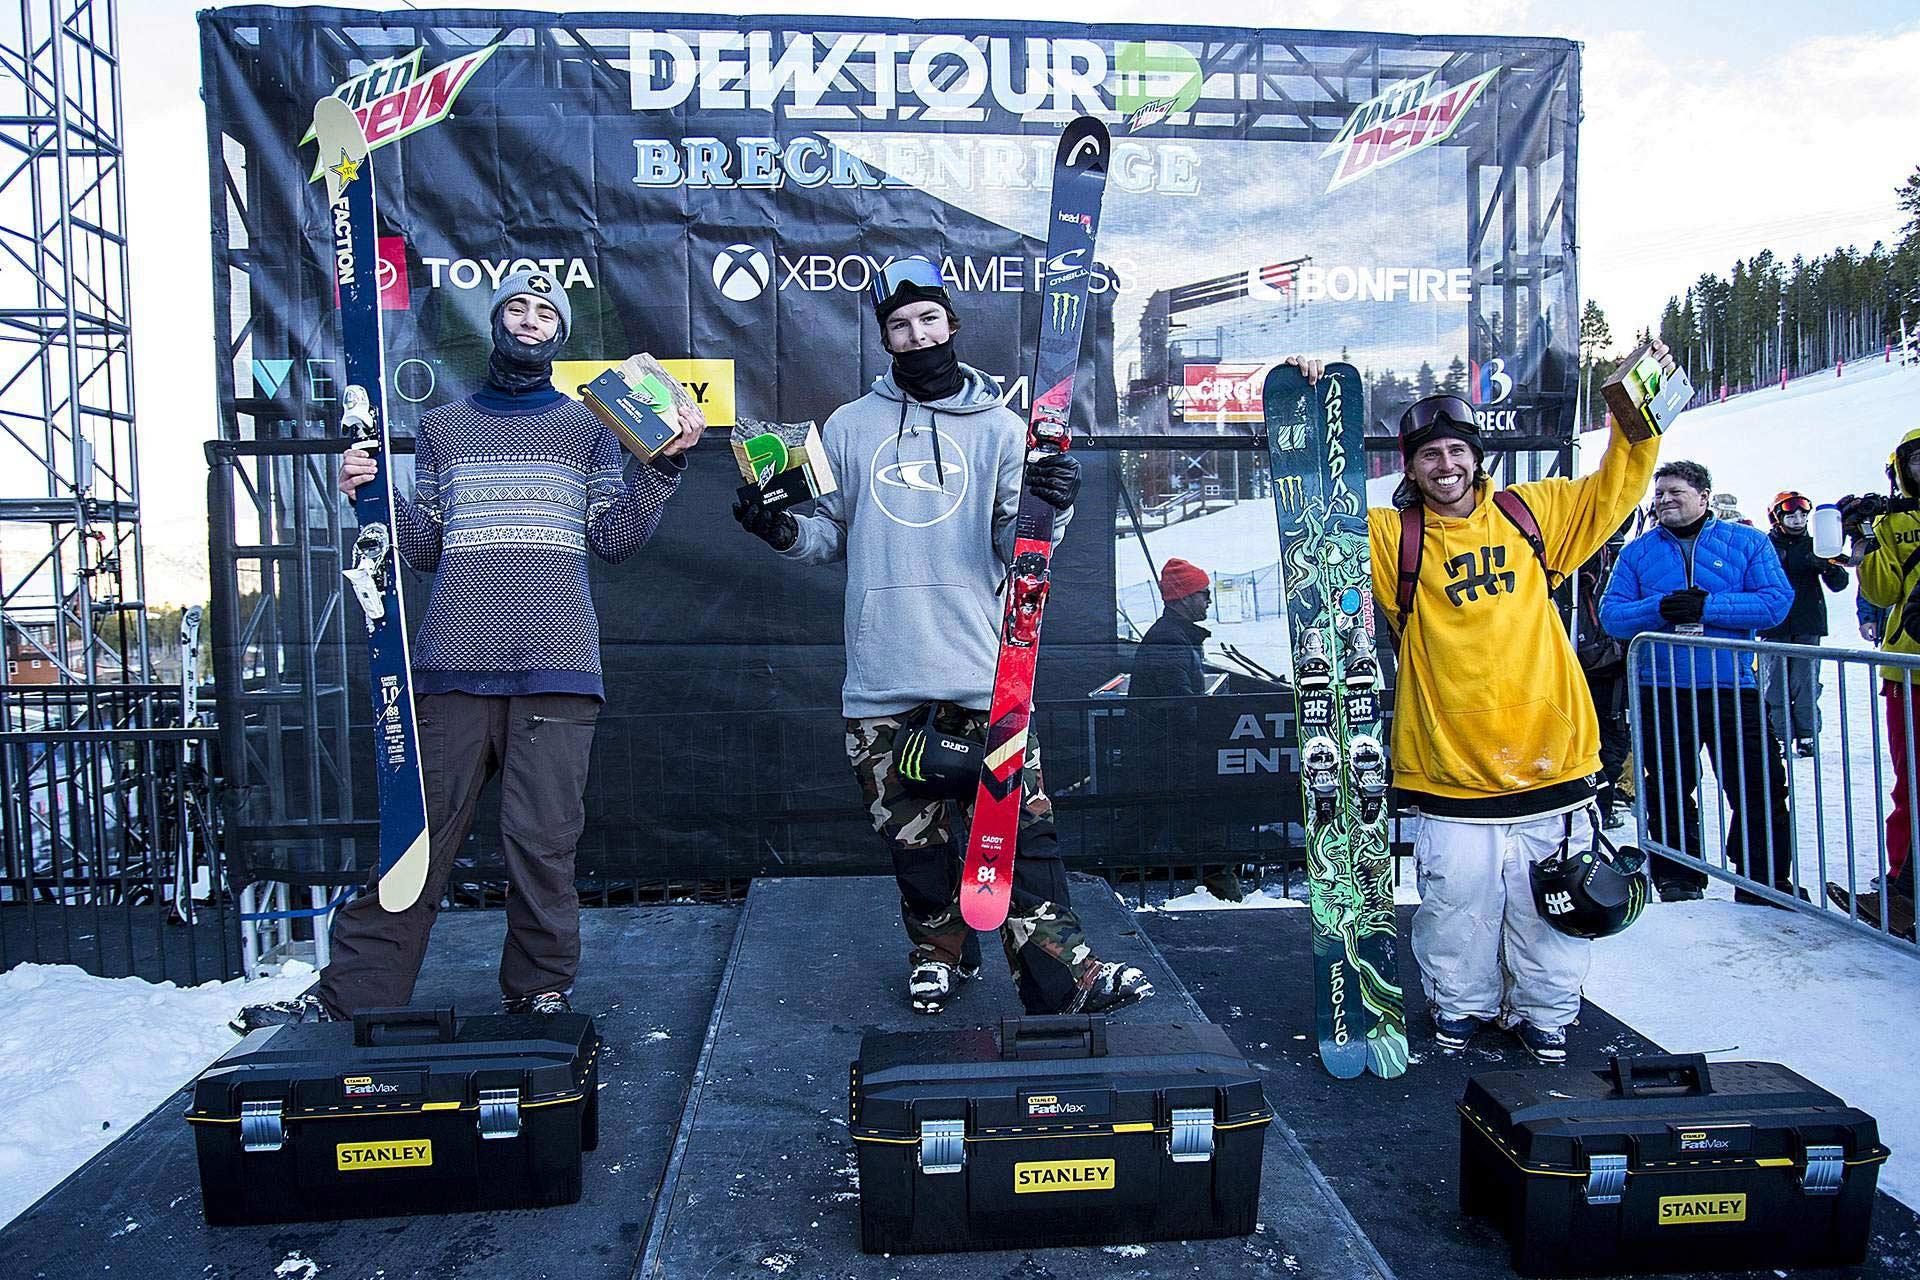 Dew Tour 2018 - Slopestyle Top 3: Alex Hall, Evan McEachran und Henrik Harlaut - Foto: dewtour.com